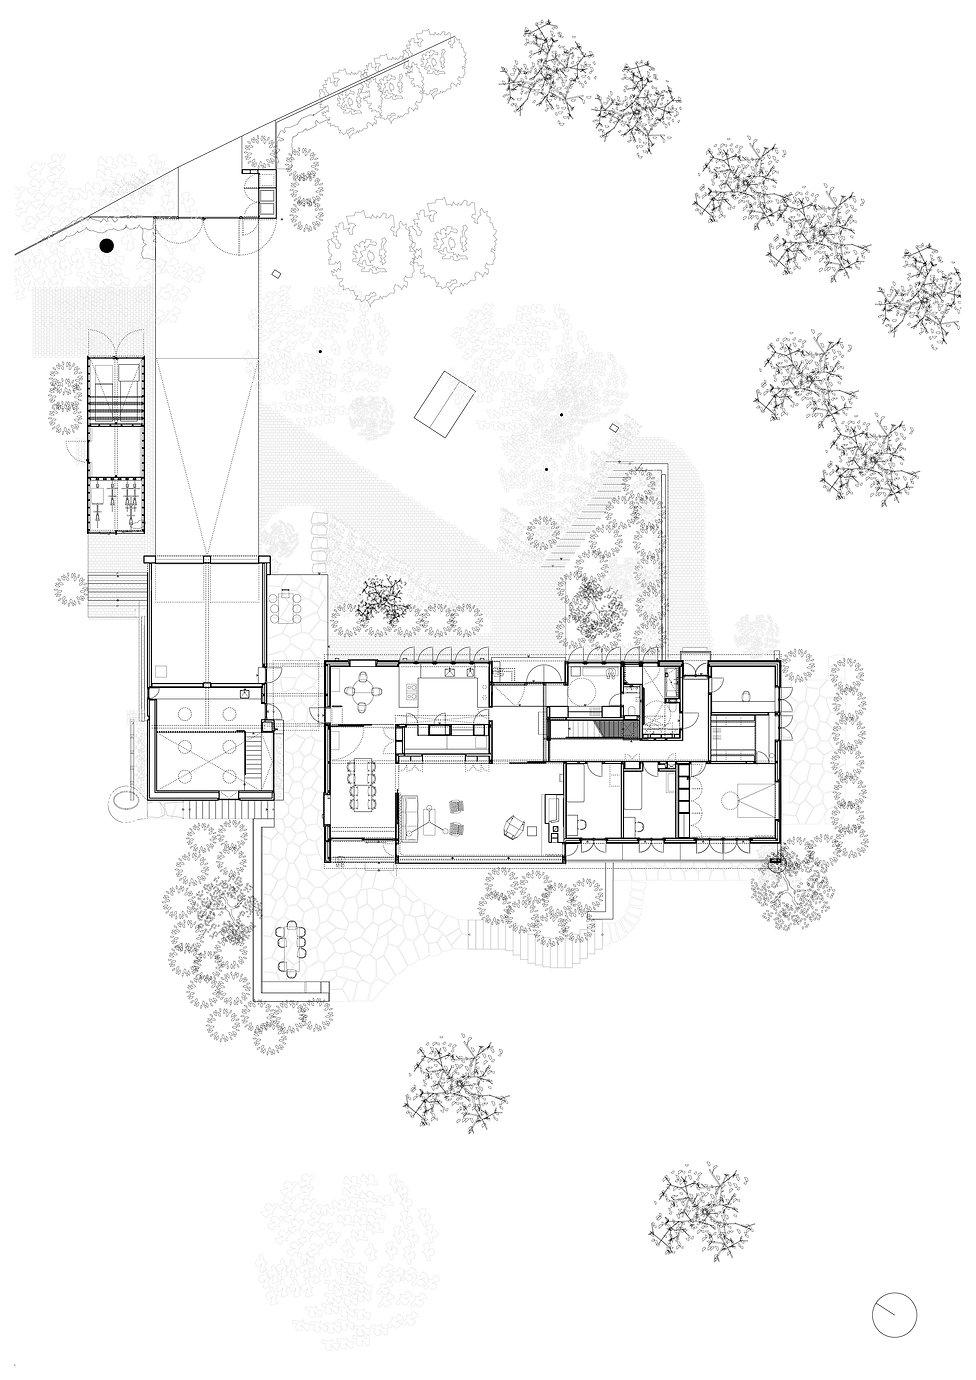 arnstein arneberg-plan.jpg